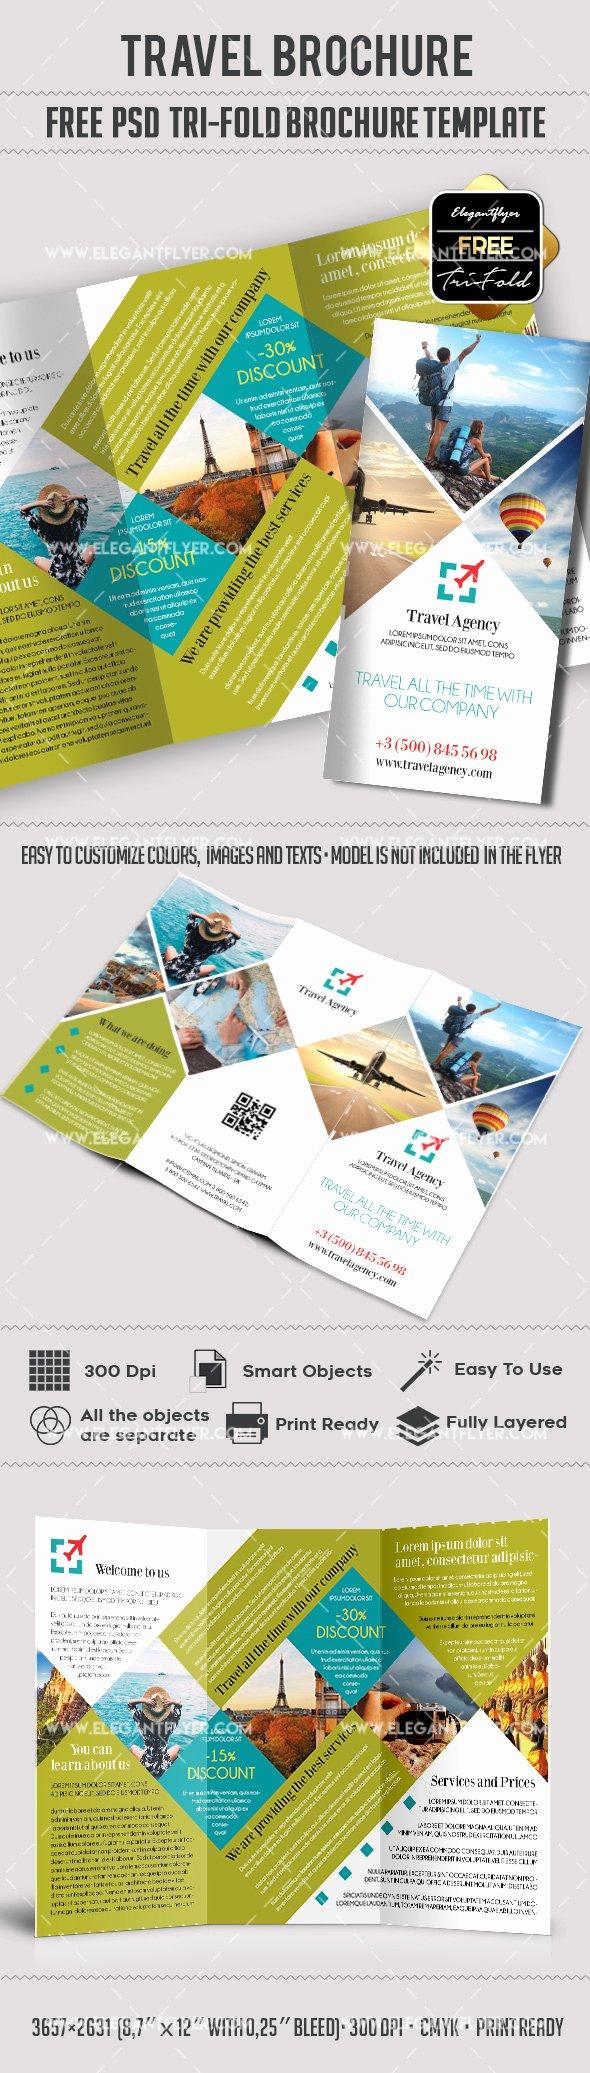 Tri Fold Travel Brochure Template Best Of Travel – Free Psd Tri Fold Psd Brochure Template – by